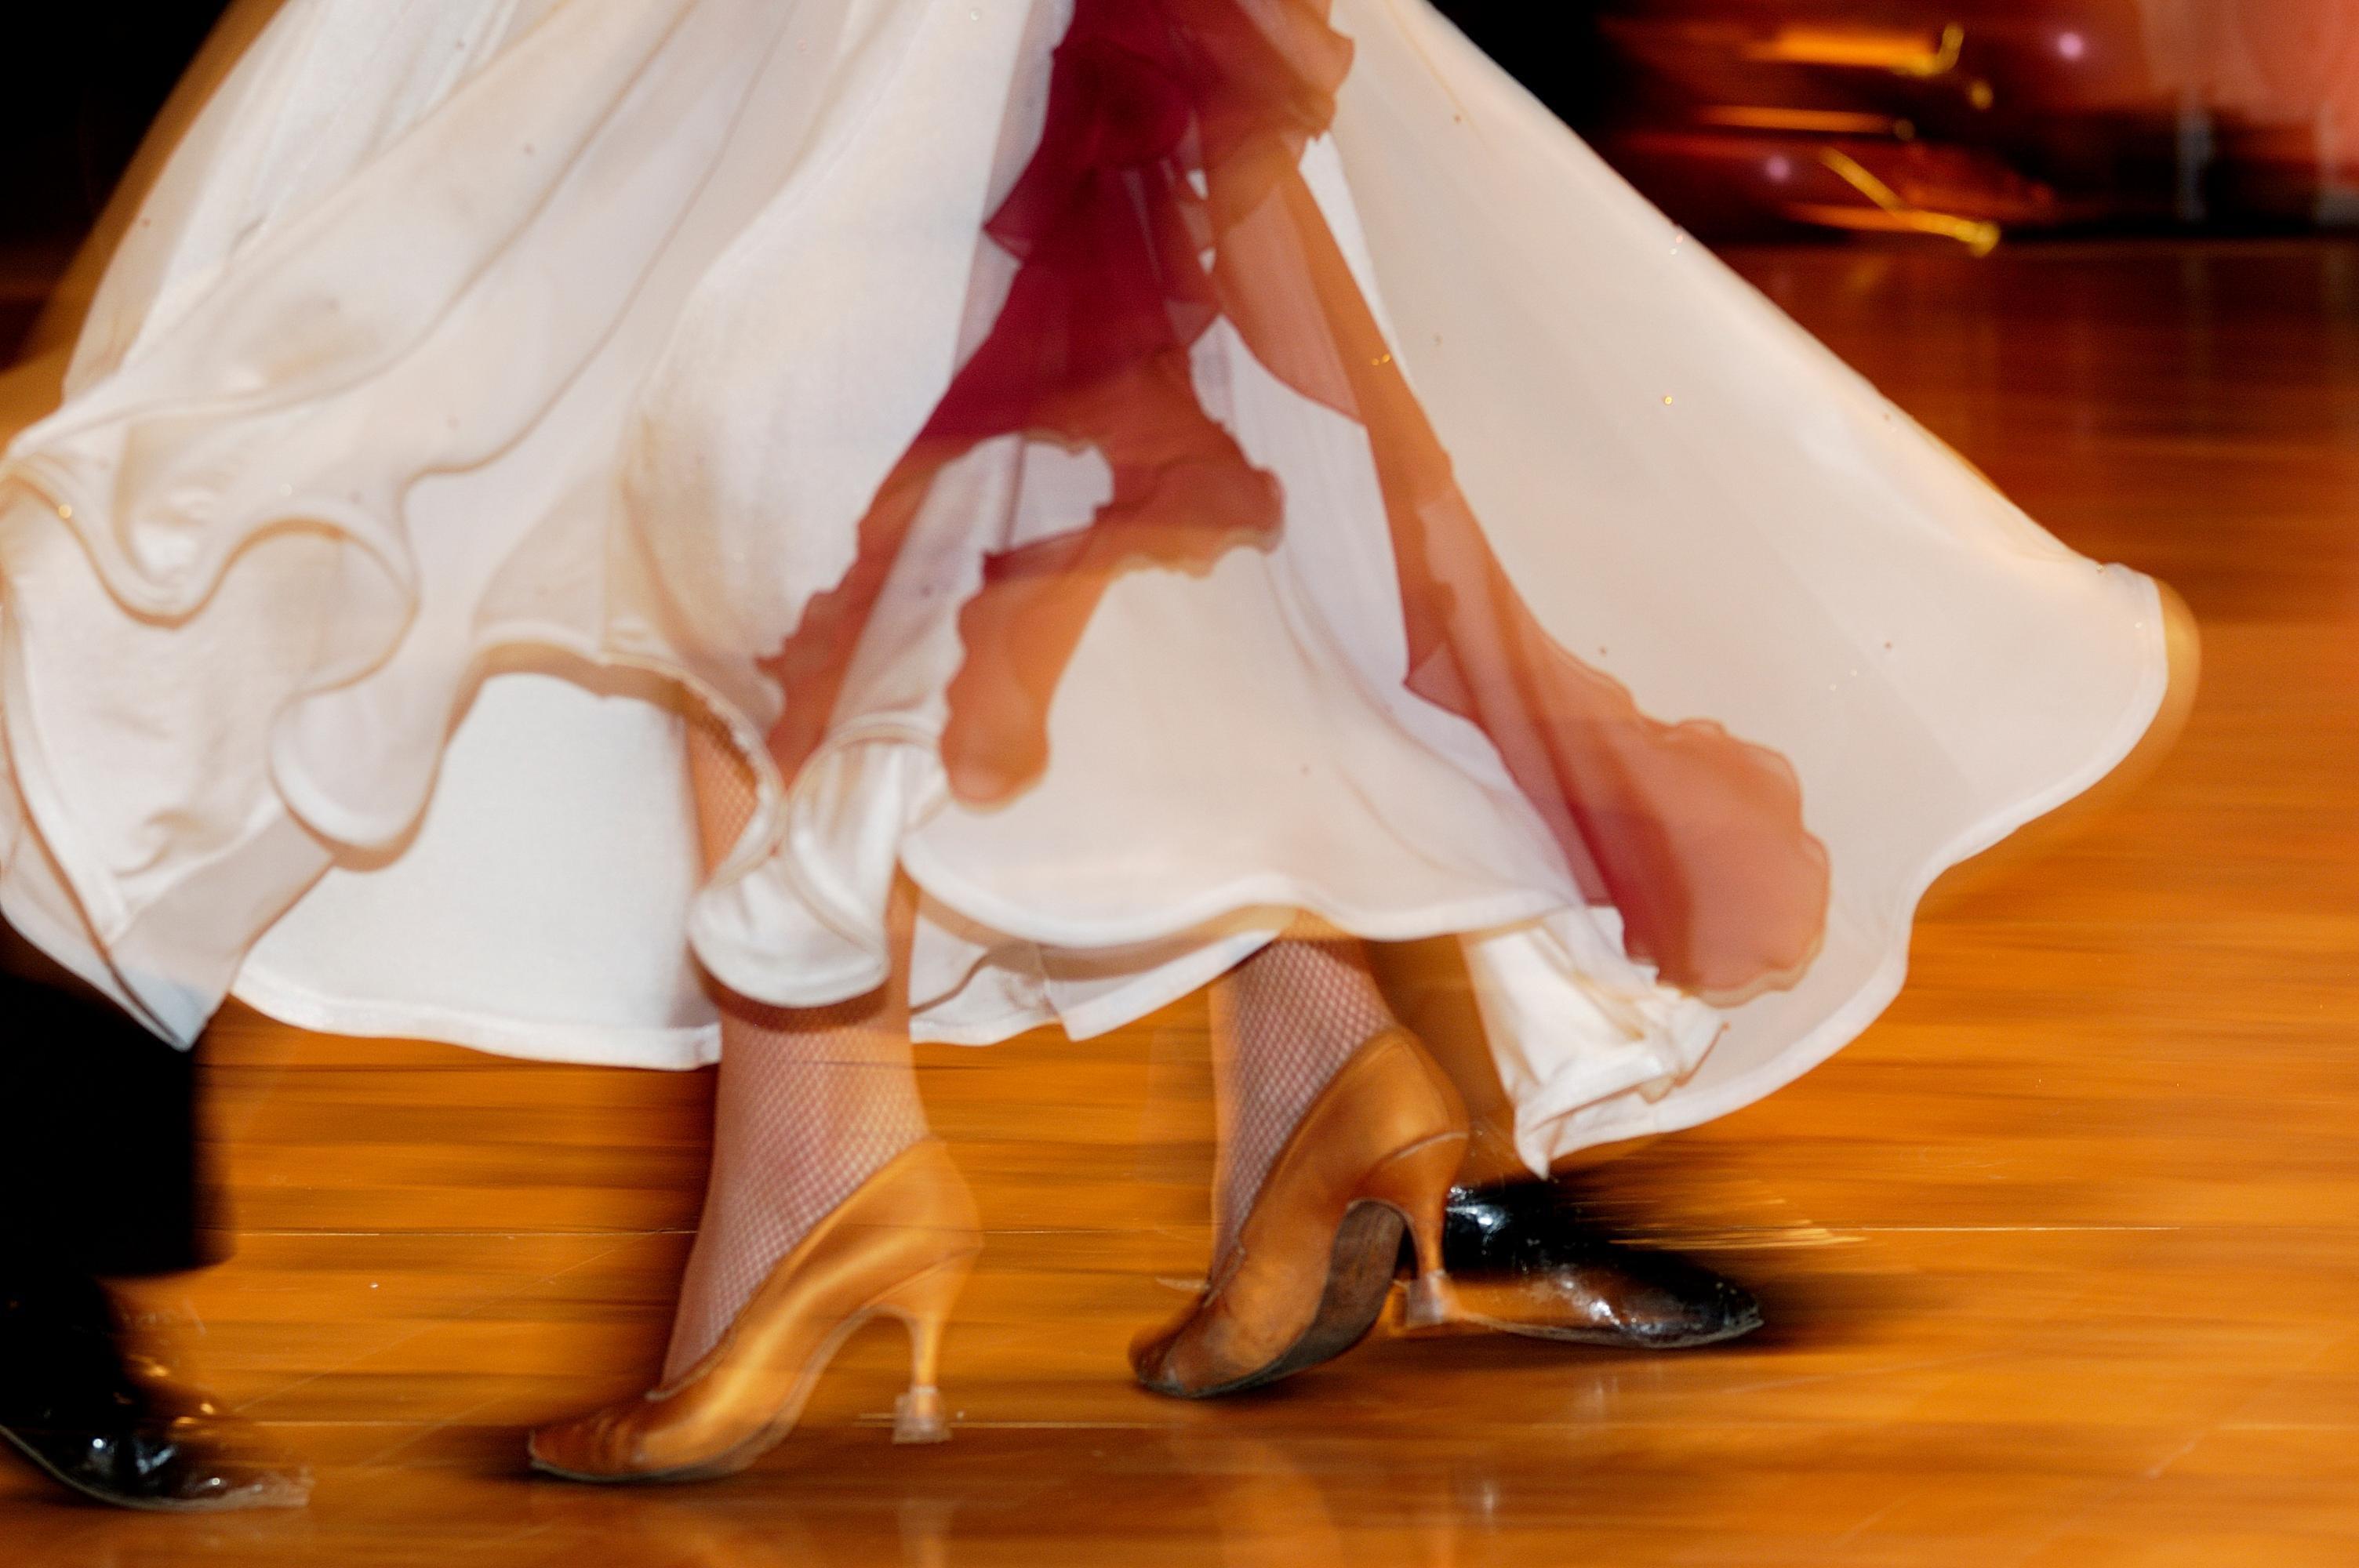 Learn the Viennese Waltz in Austria